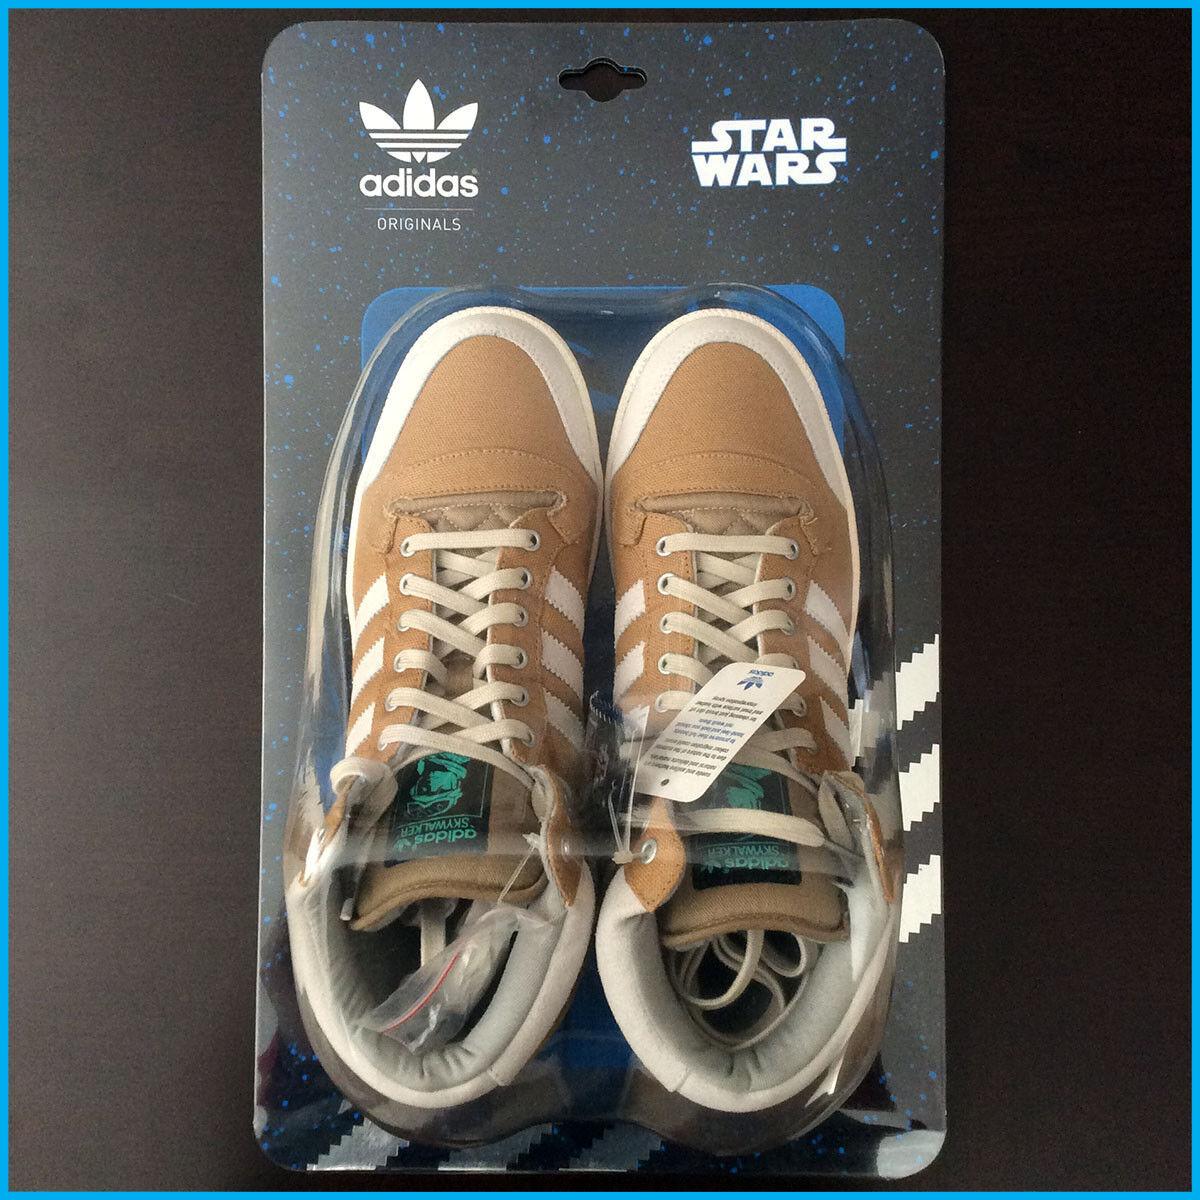 Adidas Originals - Star Wars SKYWALKER HOTH shoes White 10.5 US RARE NIB SIB